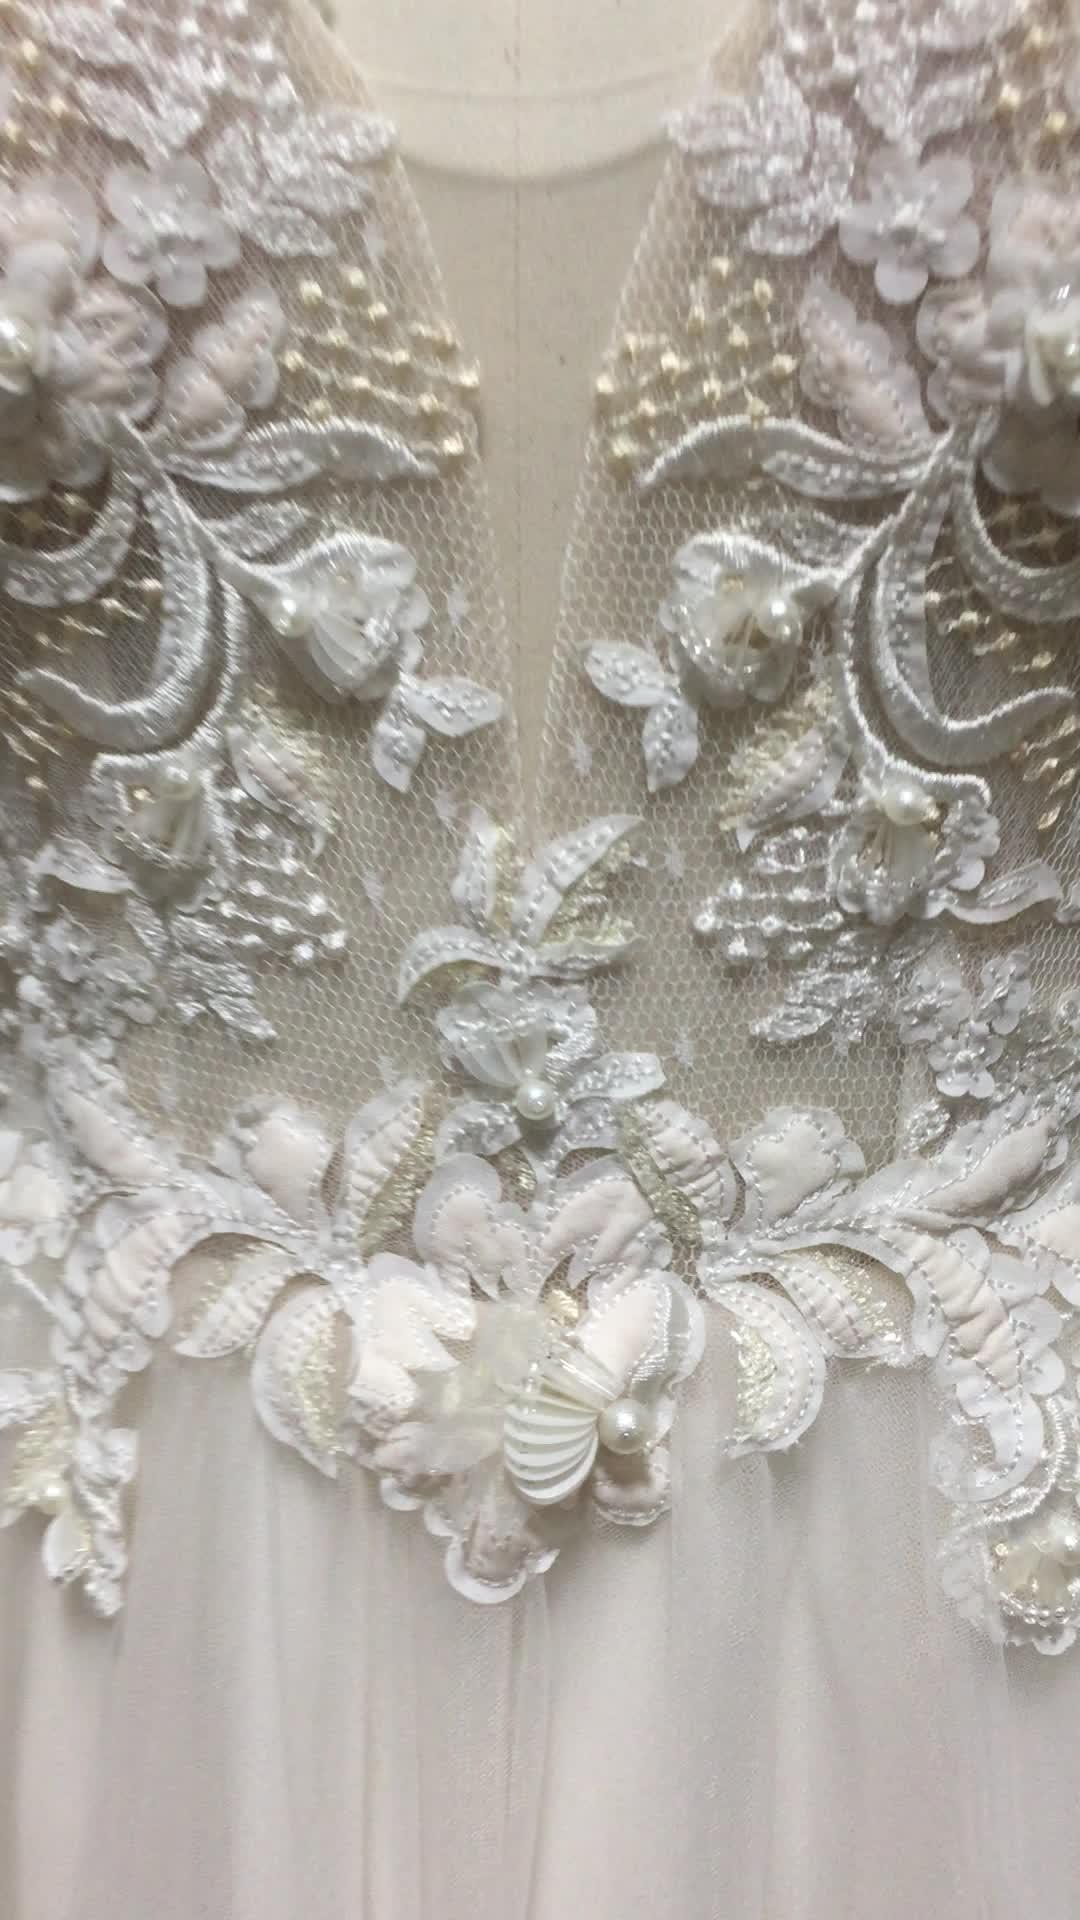 Description of งานแต่งงานชุดเจ้าสาว dressing gown